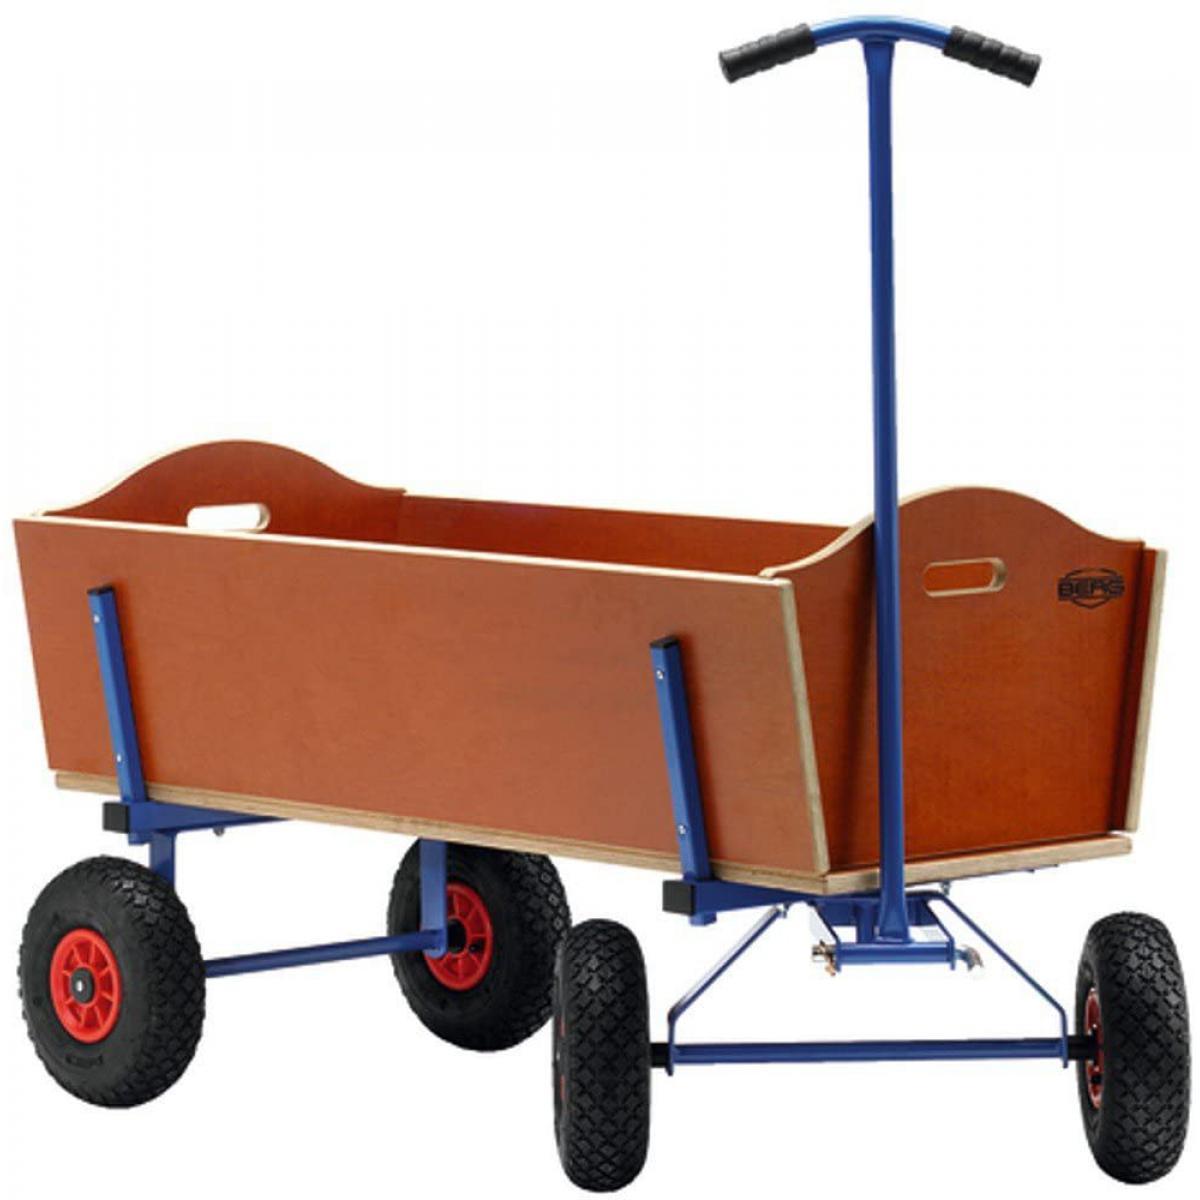 Berg Toys Chariot BERG Beachwagon XL